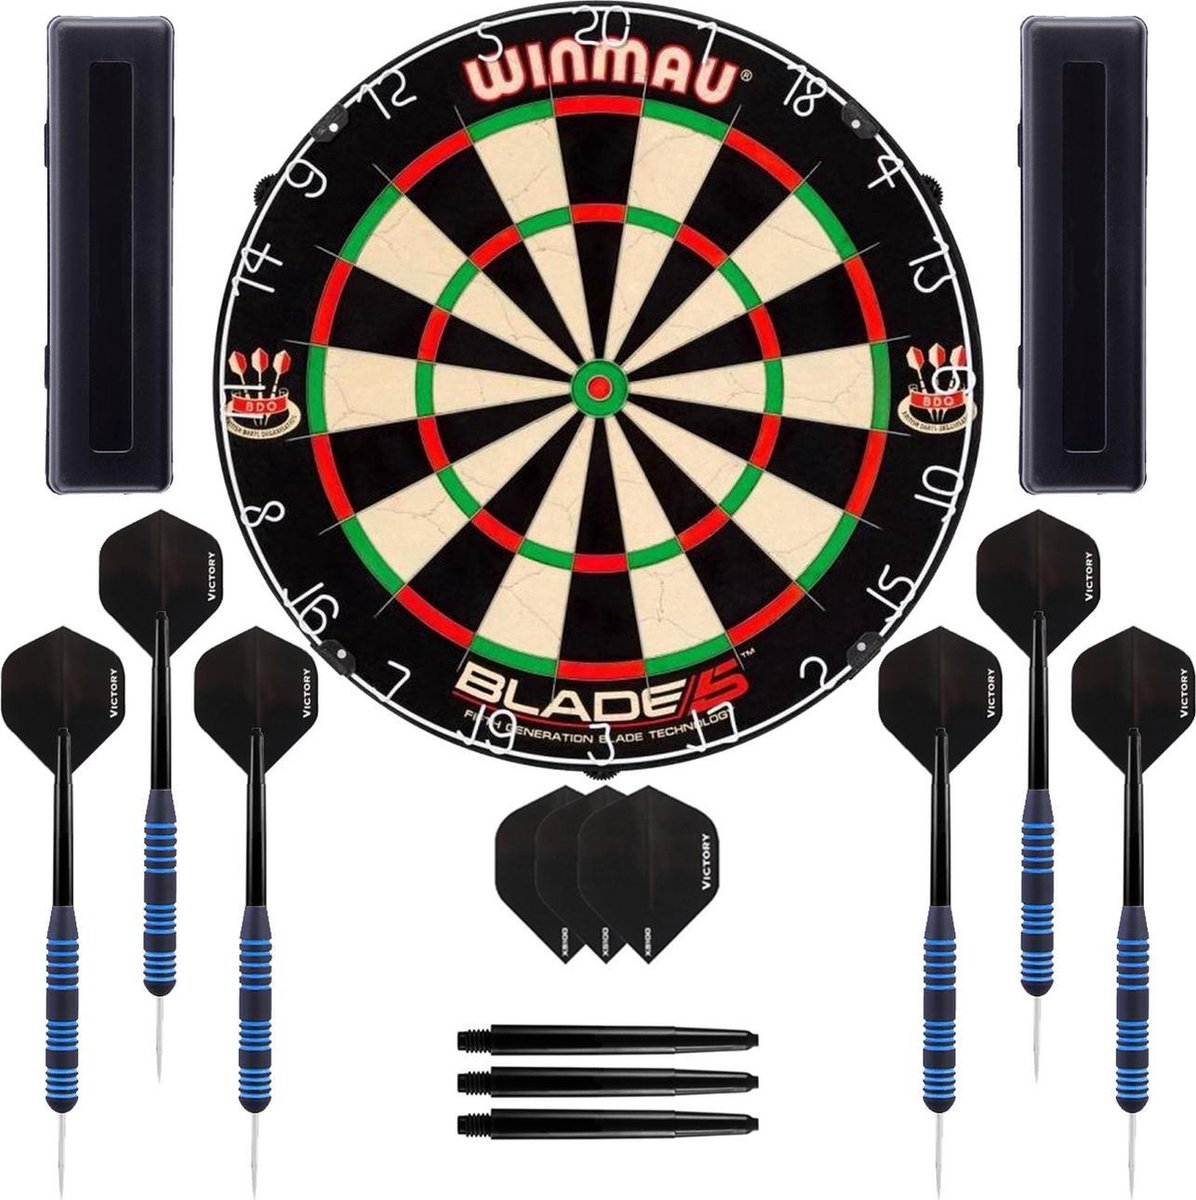 Dragon Darts Impact set - dartbord - 2 sets - dartpijlen - dart shafts - dart flights - Winmau Blade 5 - Winmau dartbord